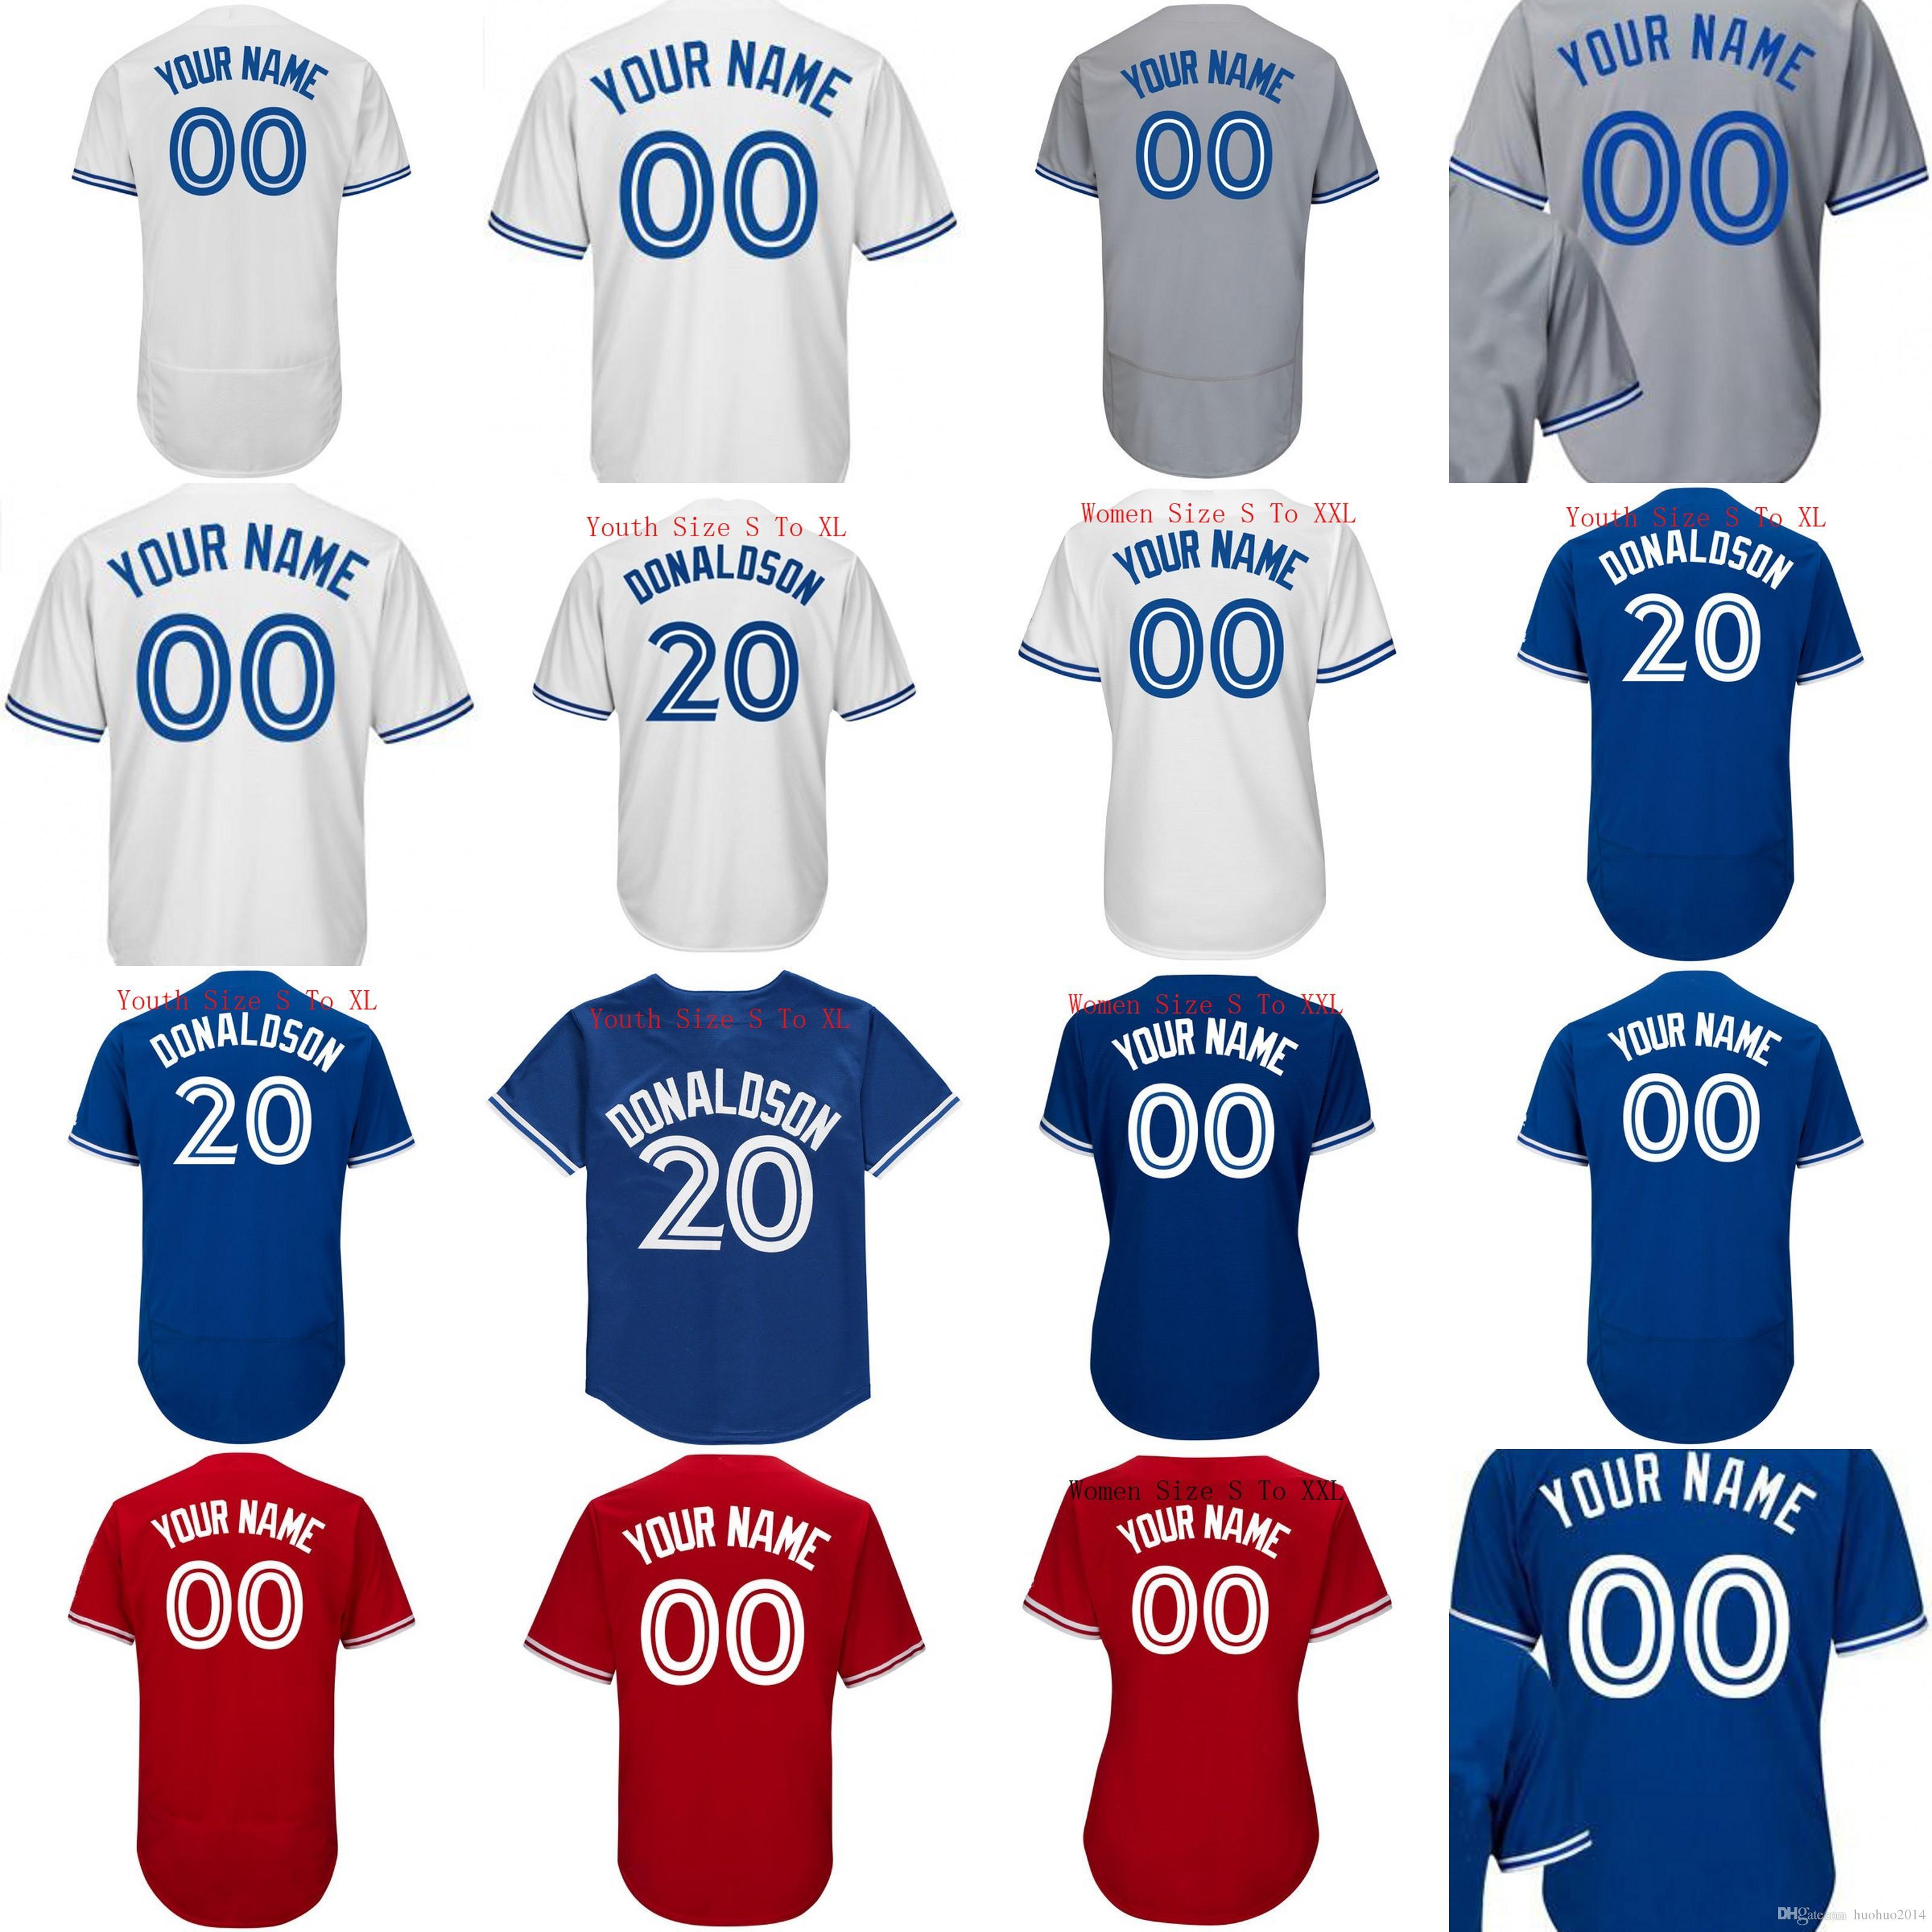 reputable site 0962a 21e02 6 Marcus Stroman 12 Roberto Alomar 11 Kevin Pillar 20 Josh Donaldson  Jerseys Women Men Youht Custom Baseball Jersey